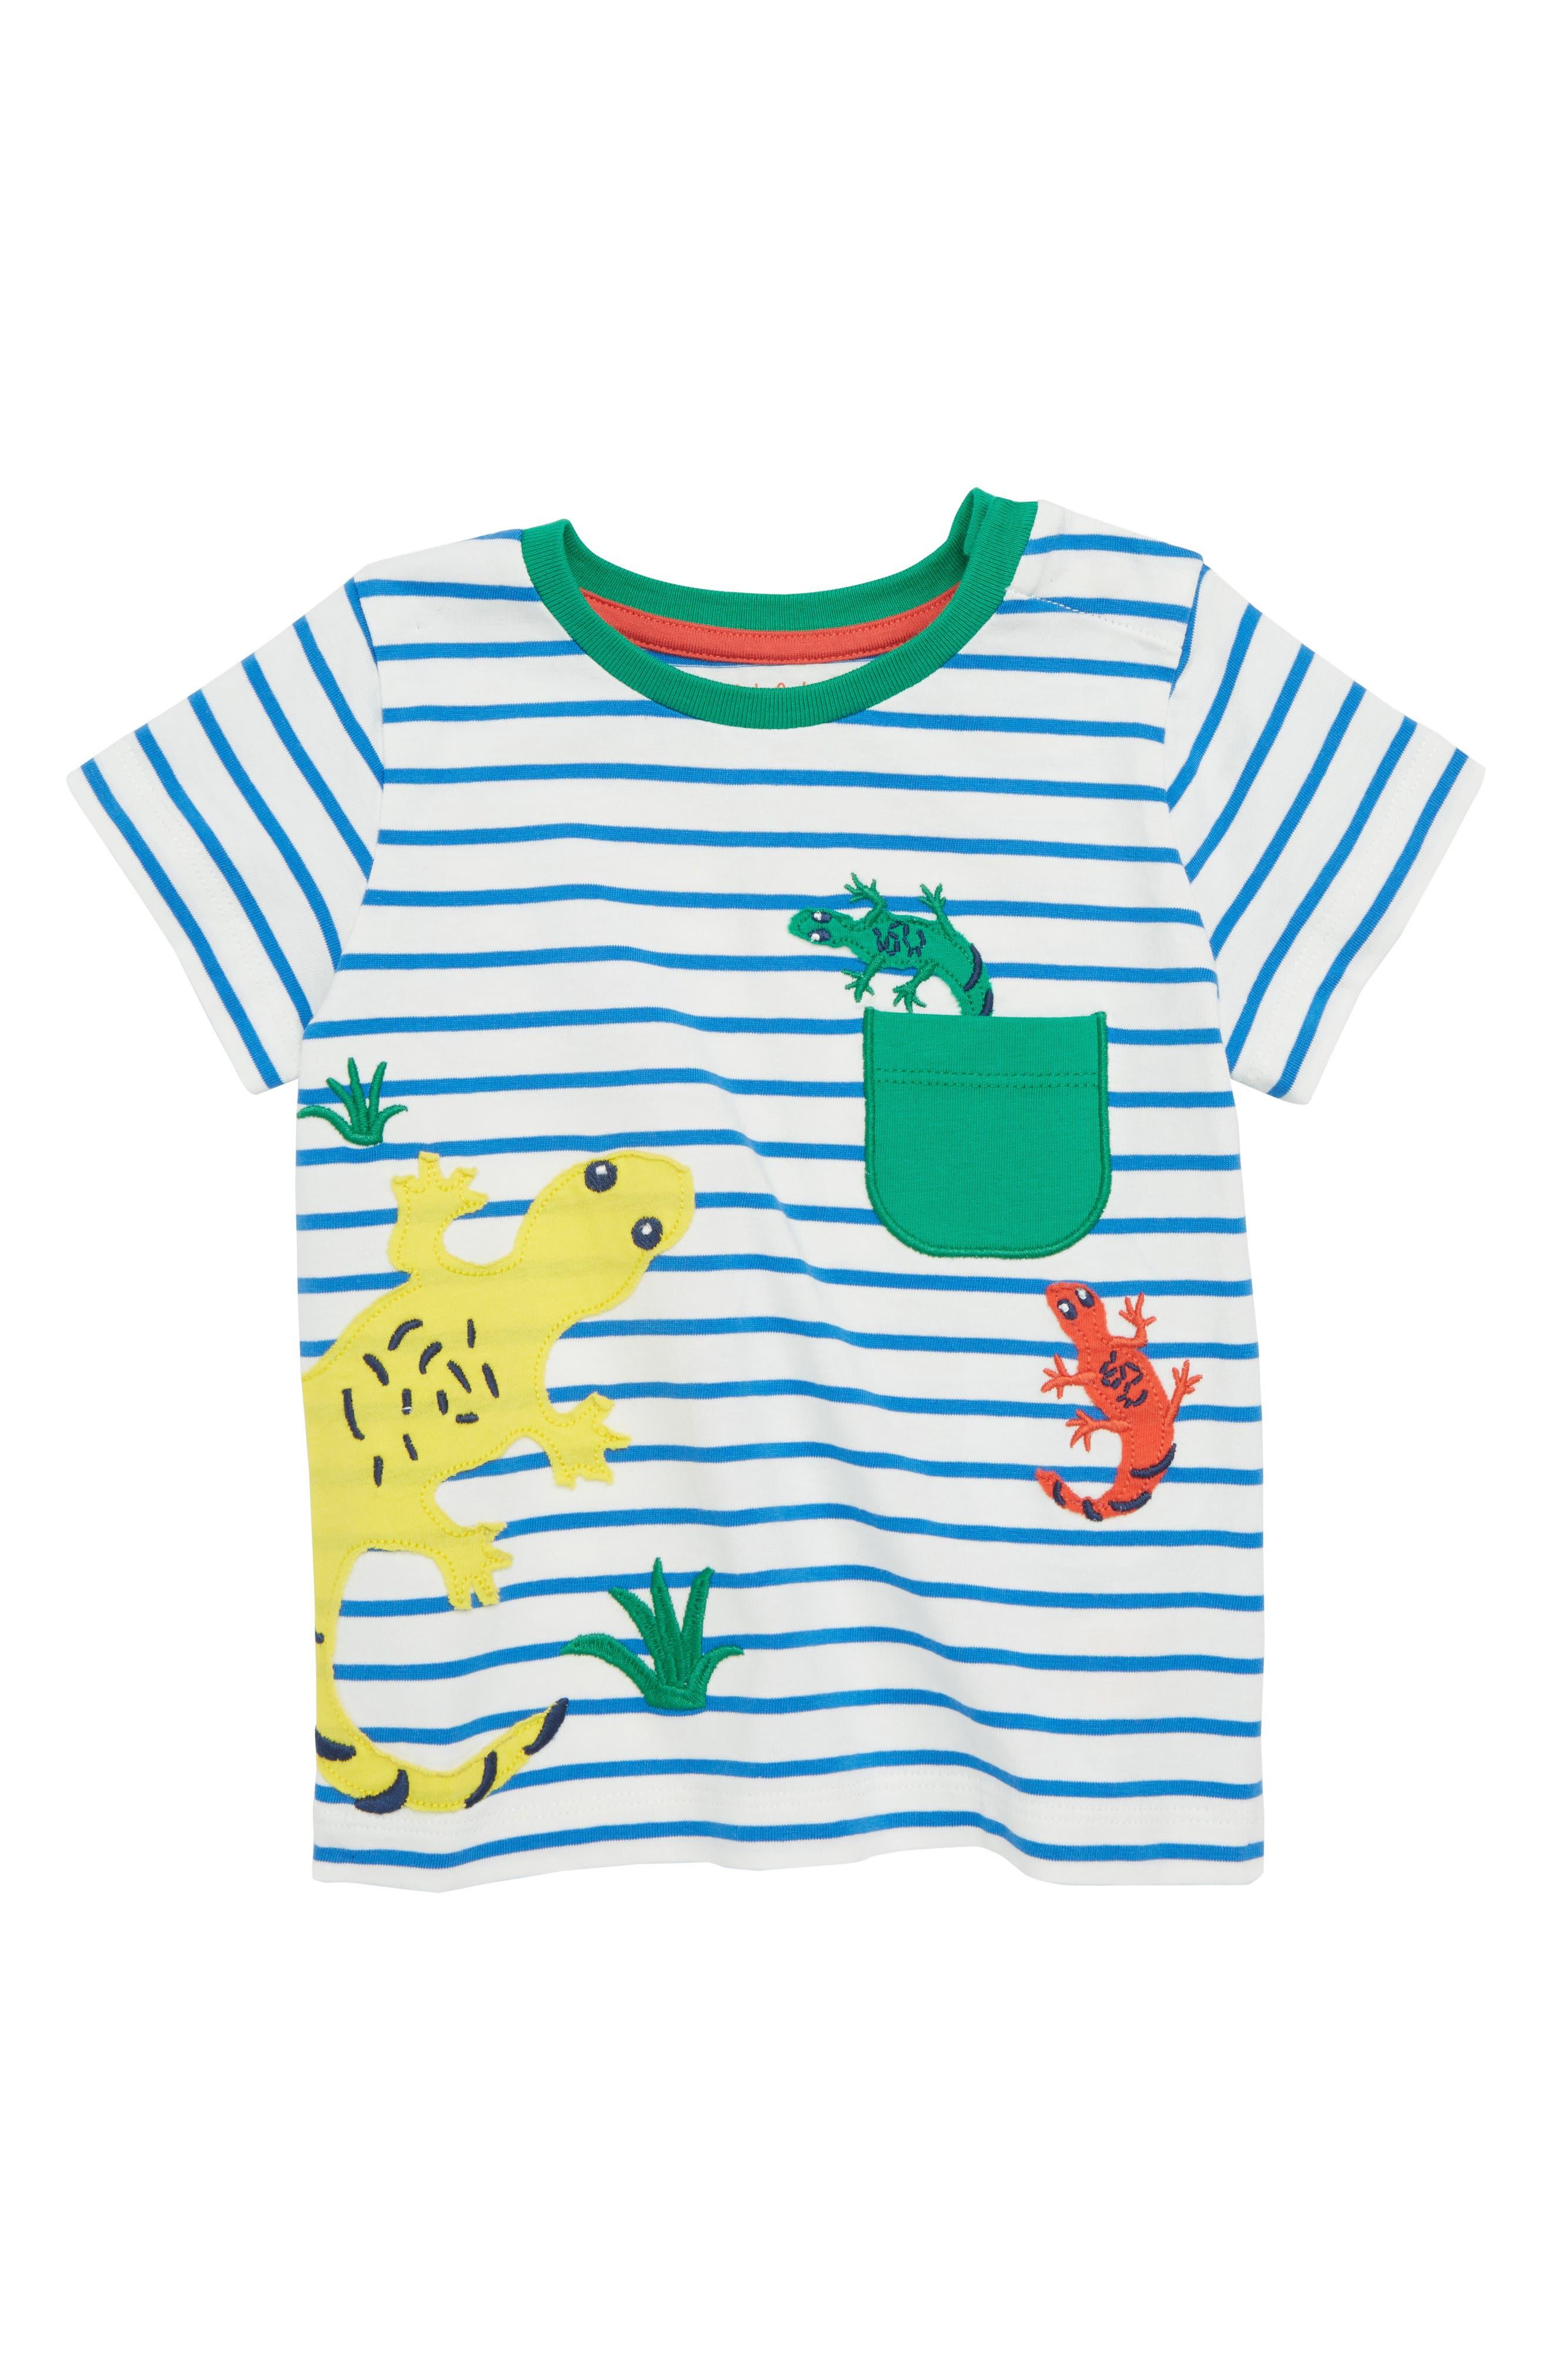 Pocket Friends T-Shirt,                             Main thumbnail 1, color,                             424